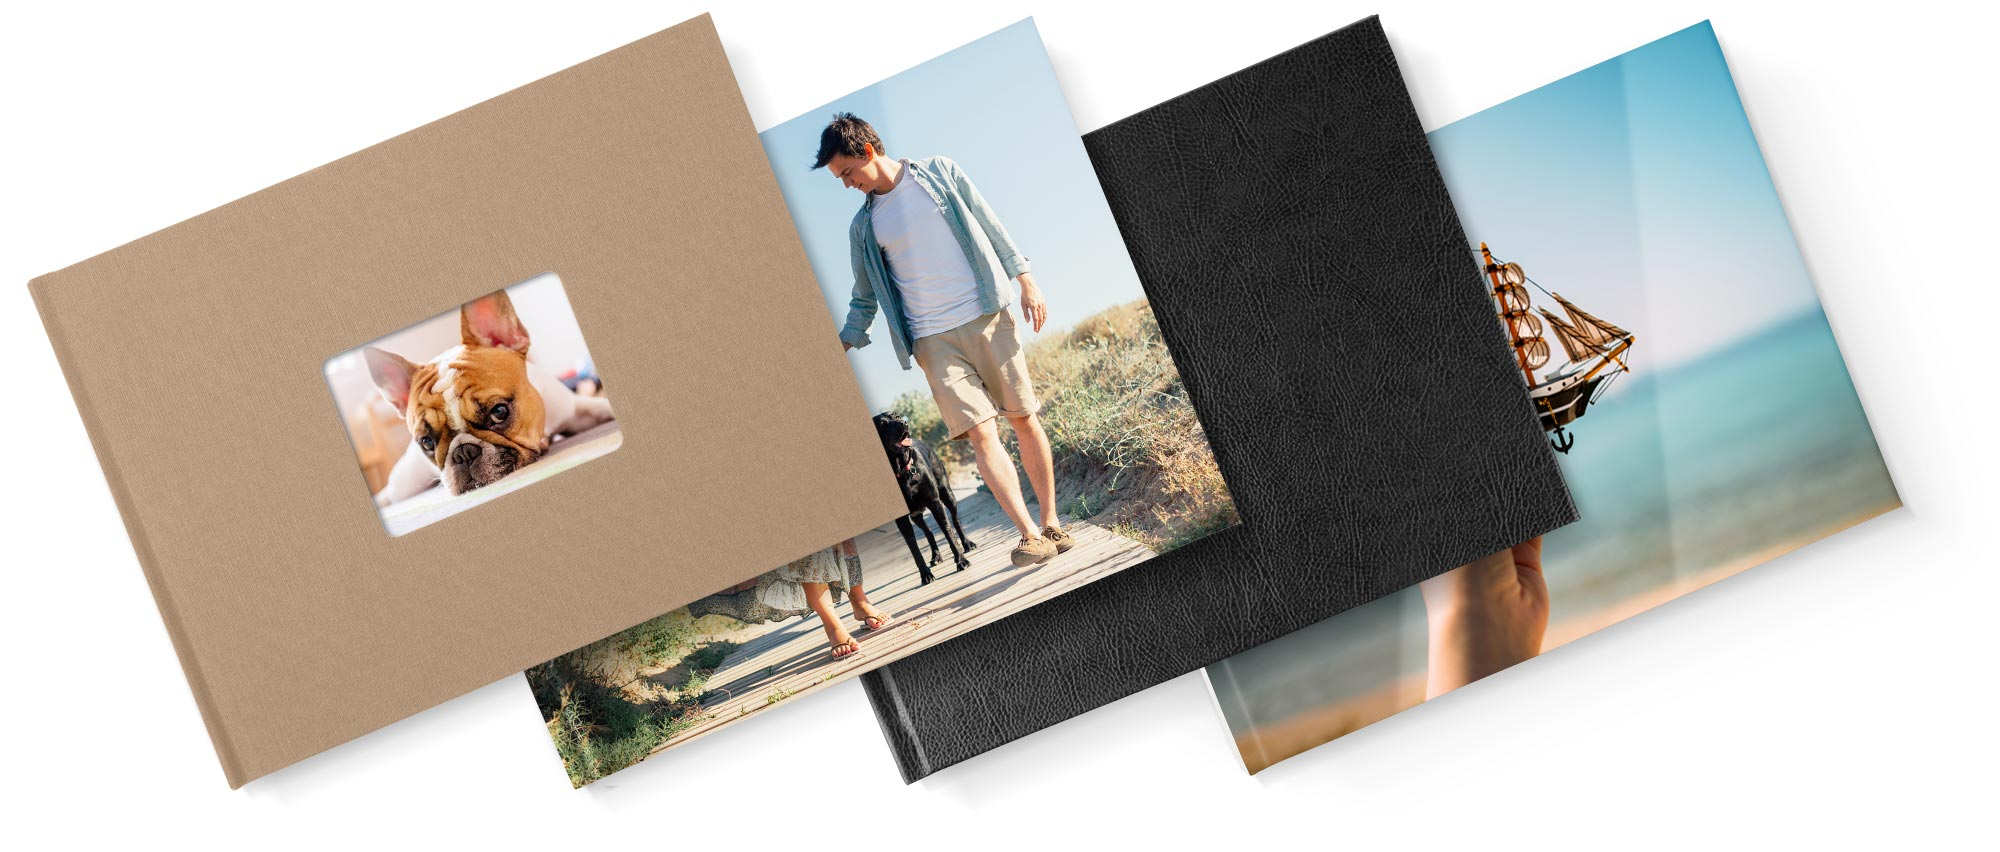 how to use snapfish photo book